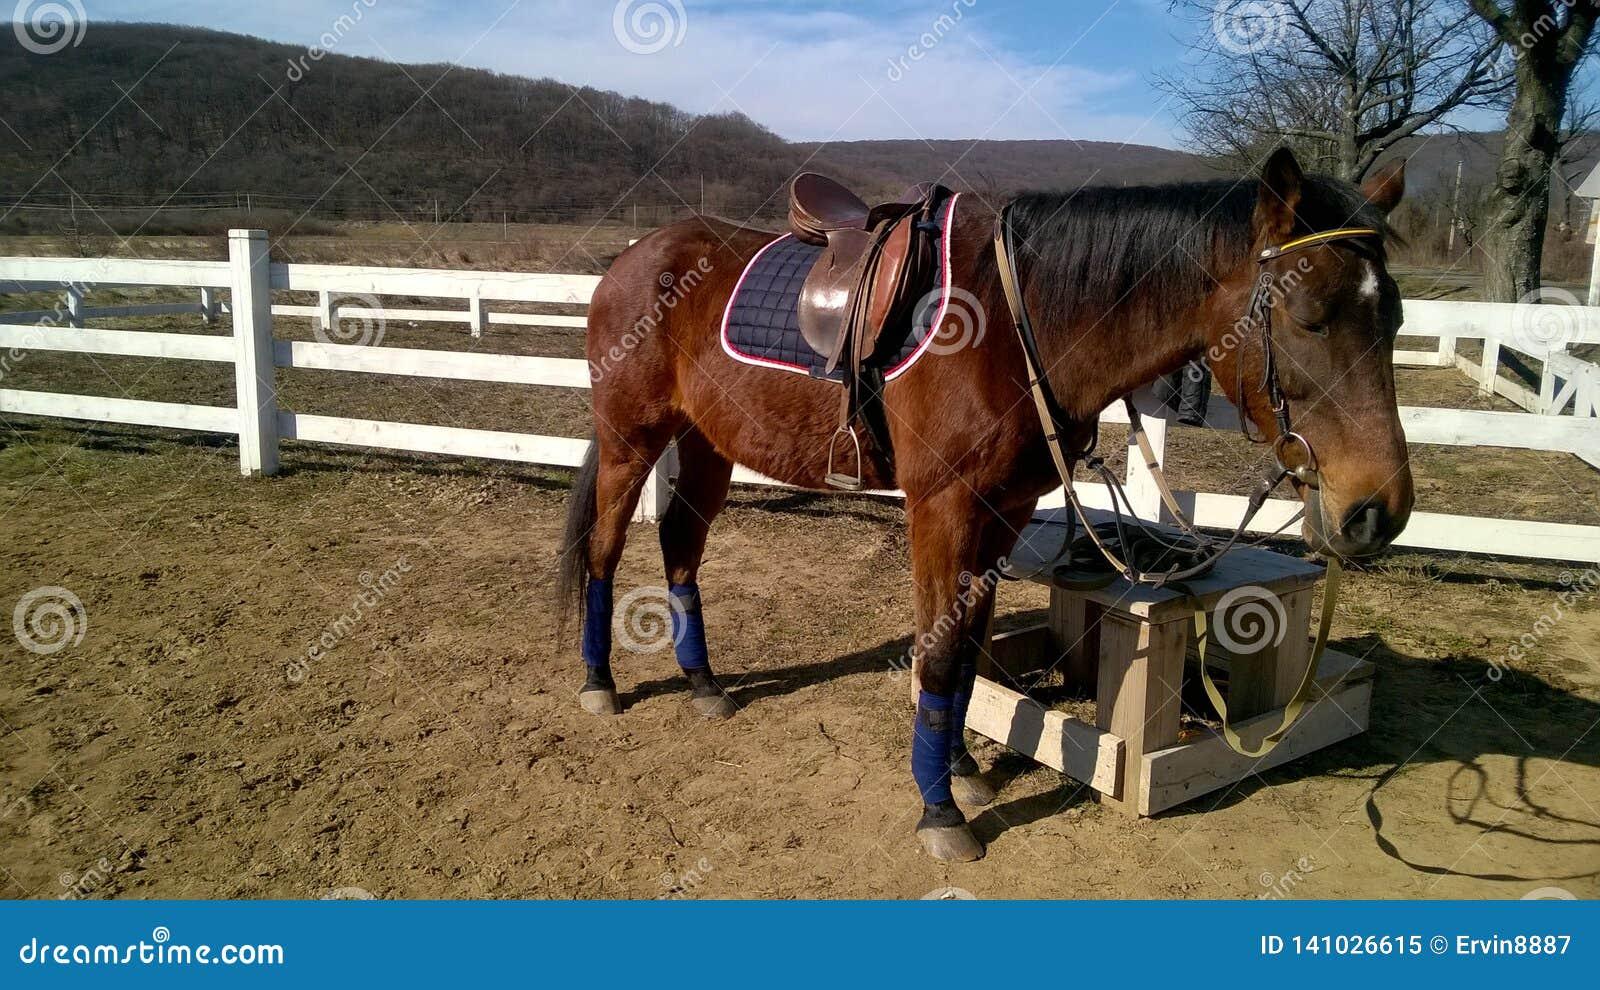 Sport horse before training awaits rider